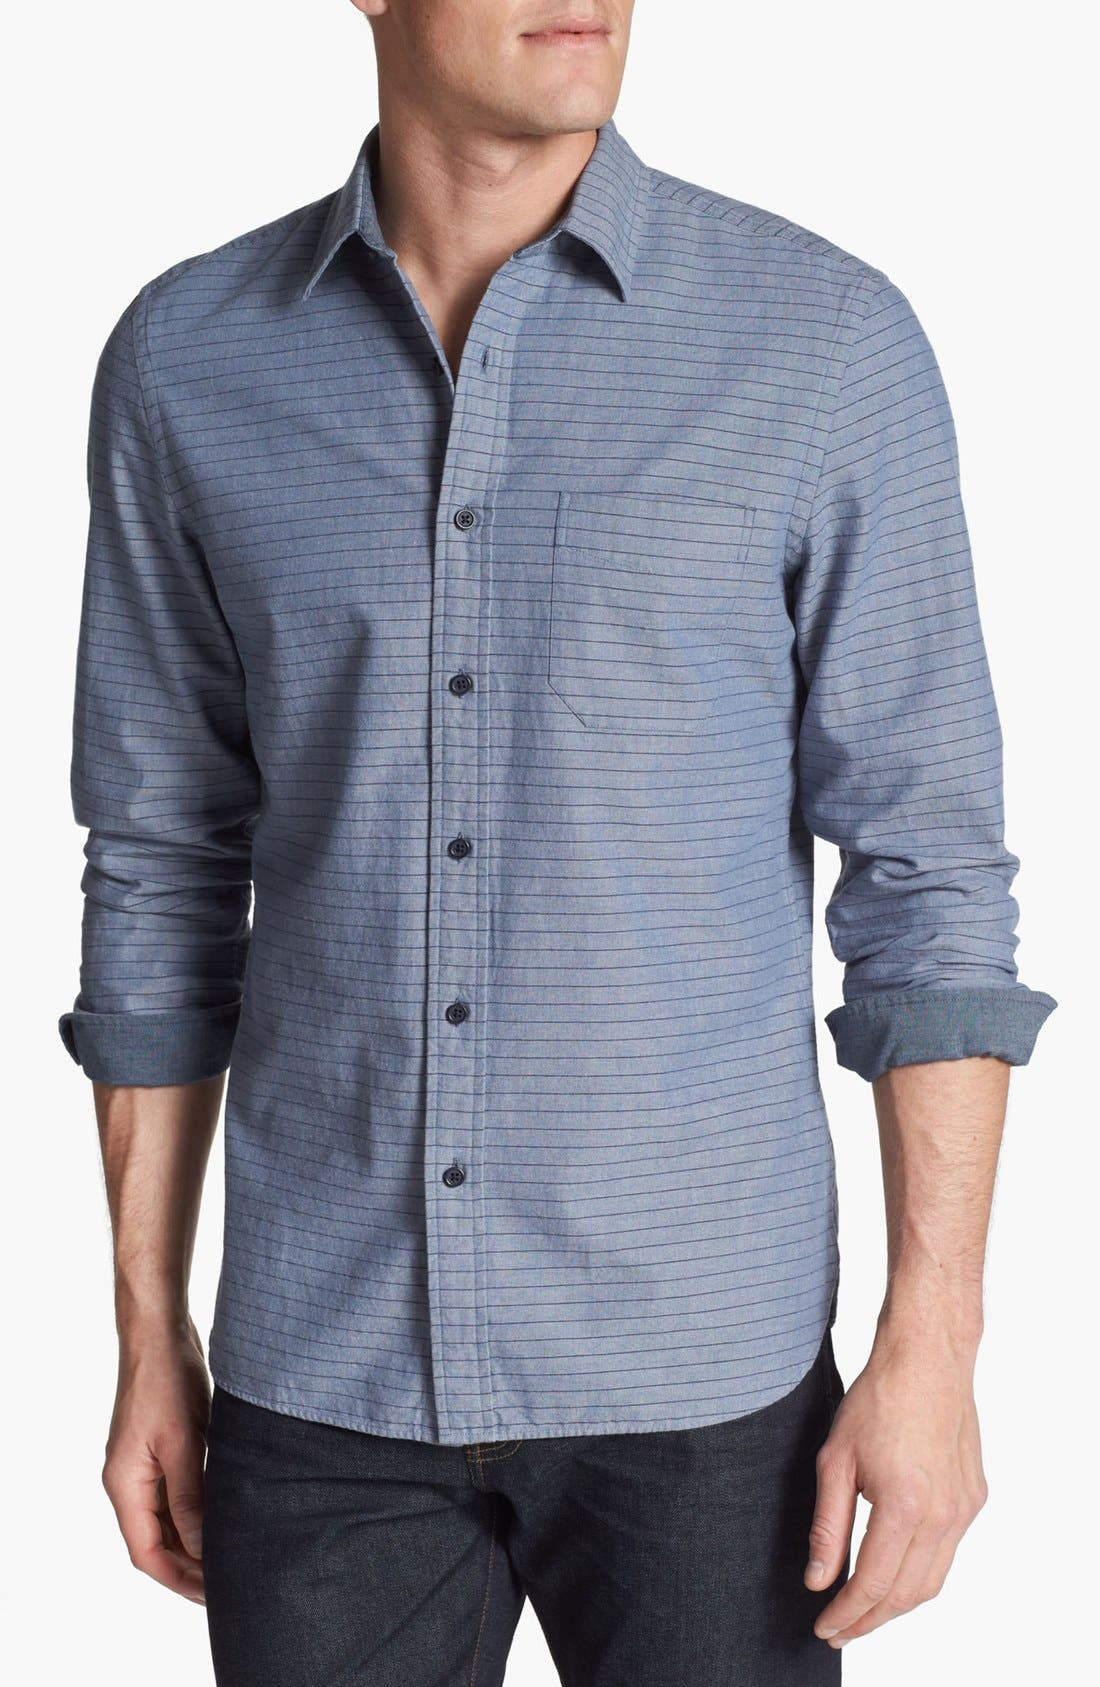 Alternate Image 1 Selected - Wallin & Bros. Trim Fit Sport Shirt